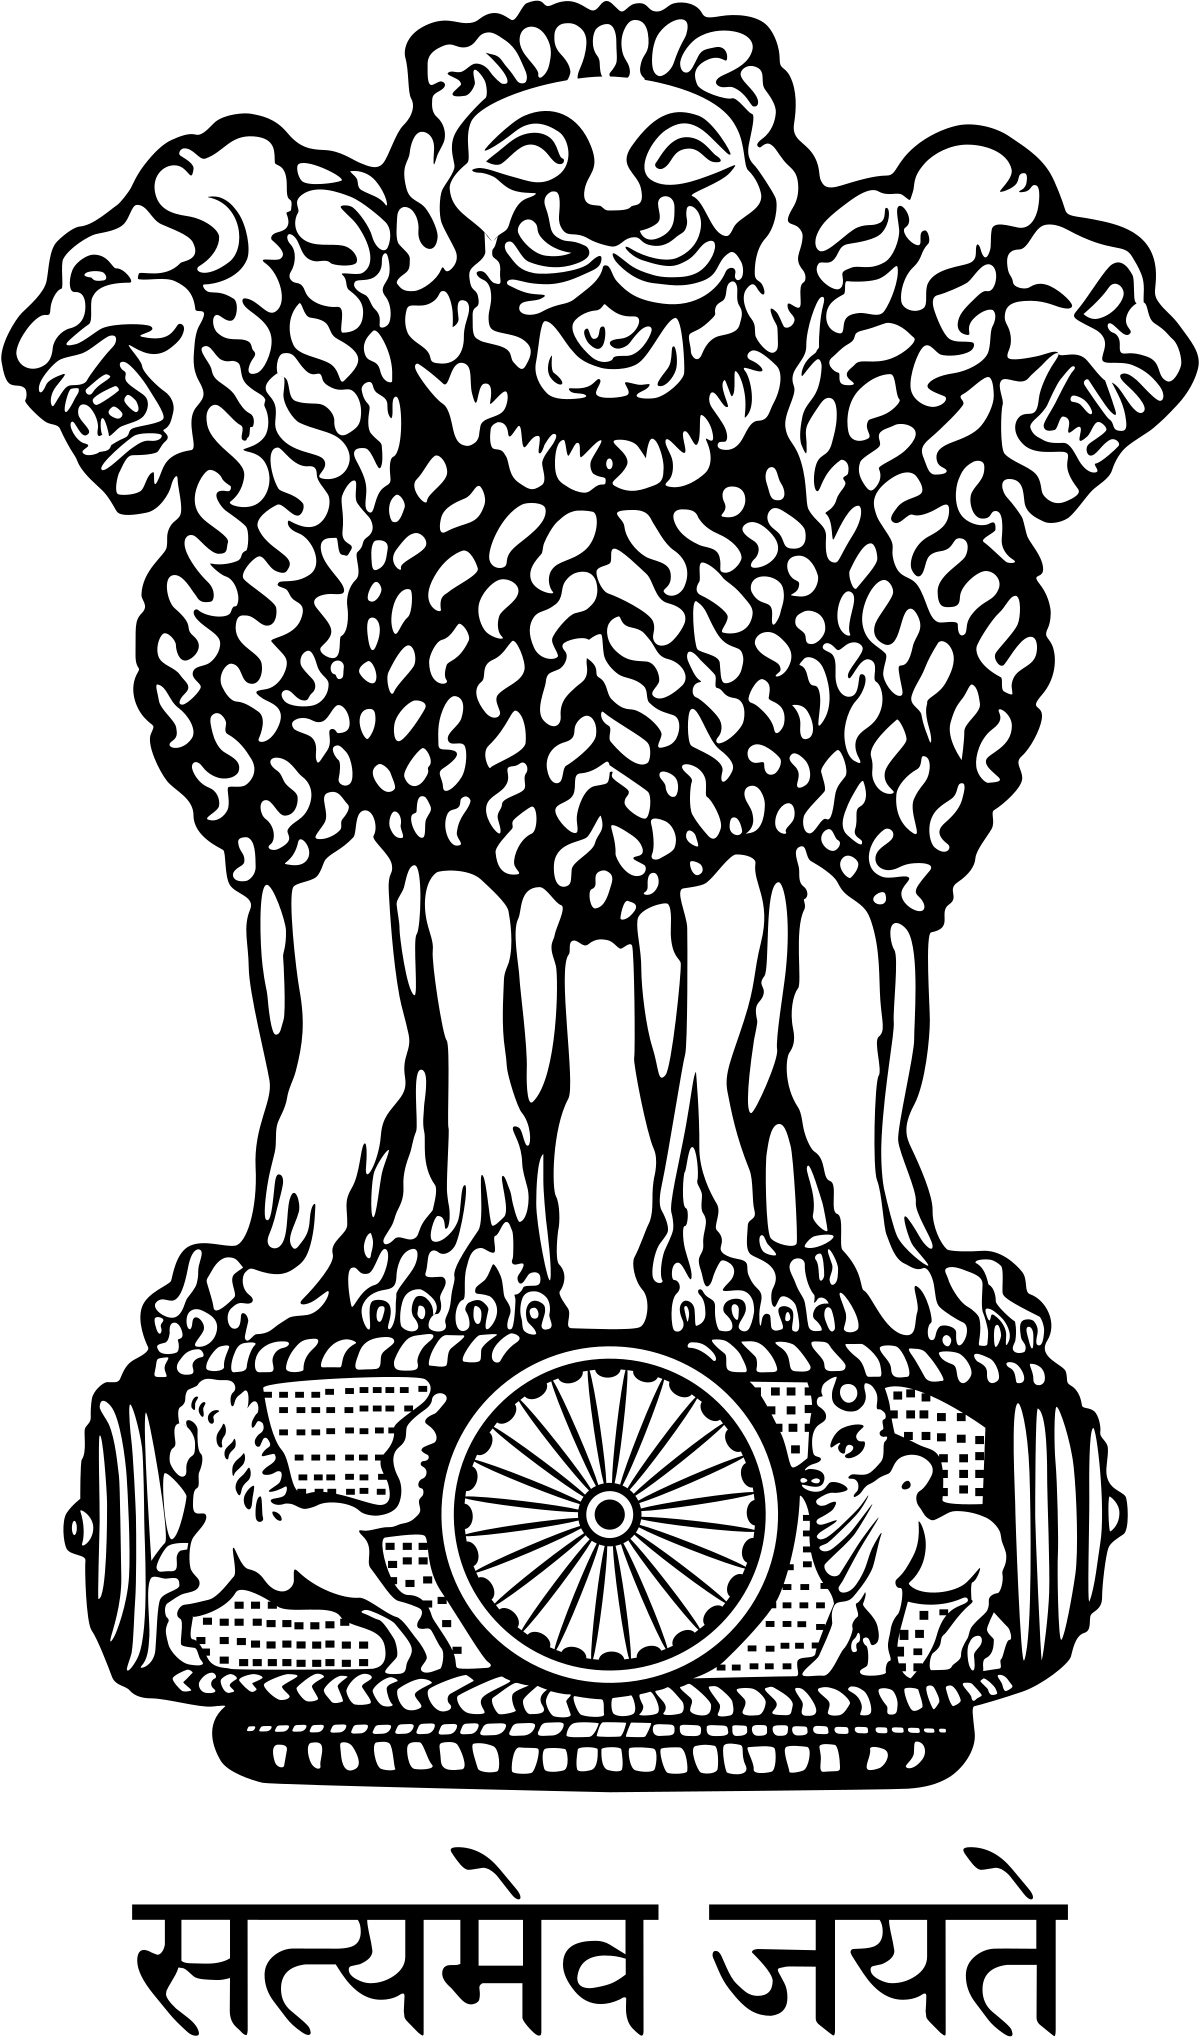 clip art transparent stock State Emblem of India